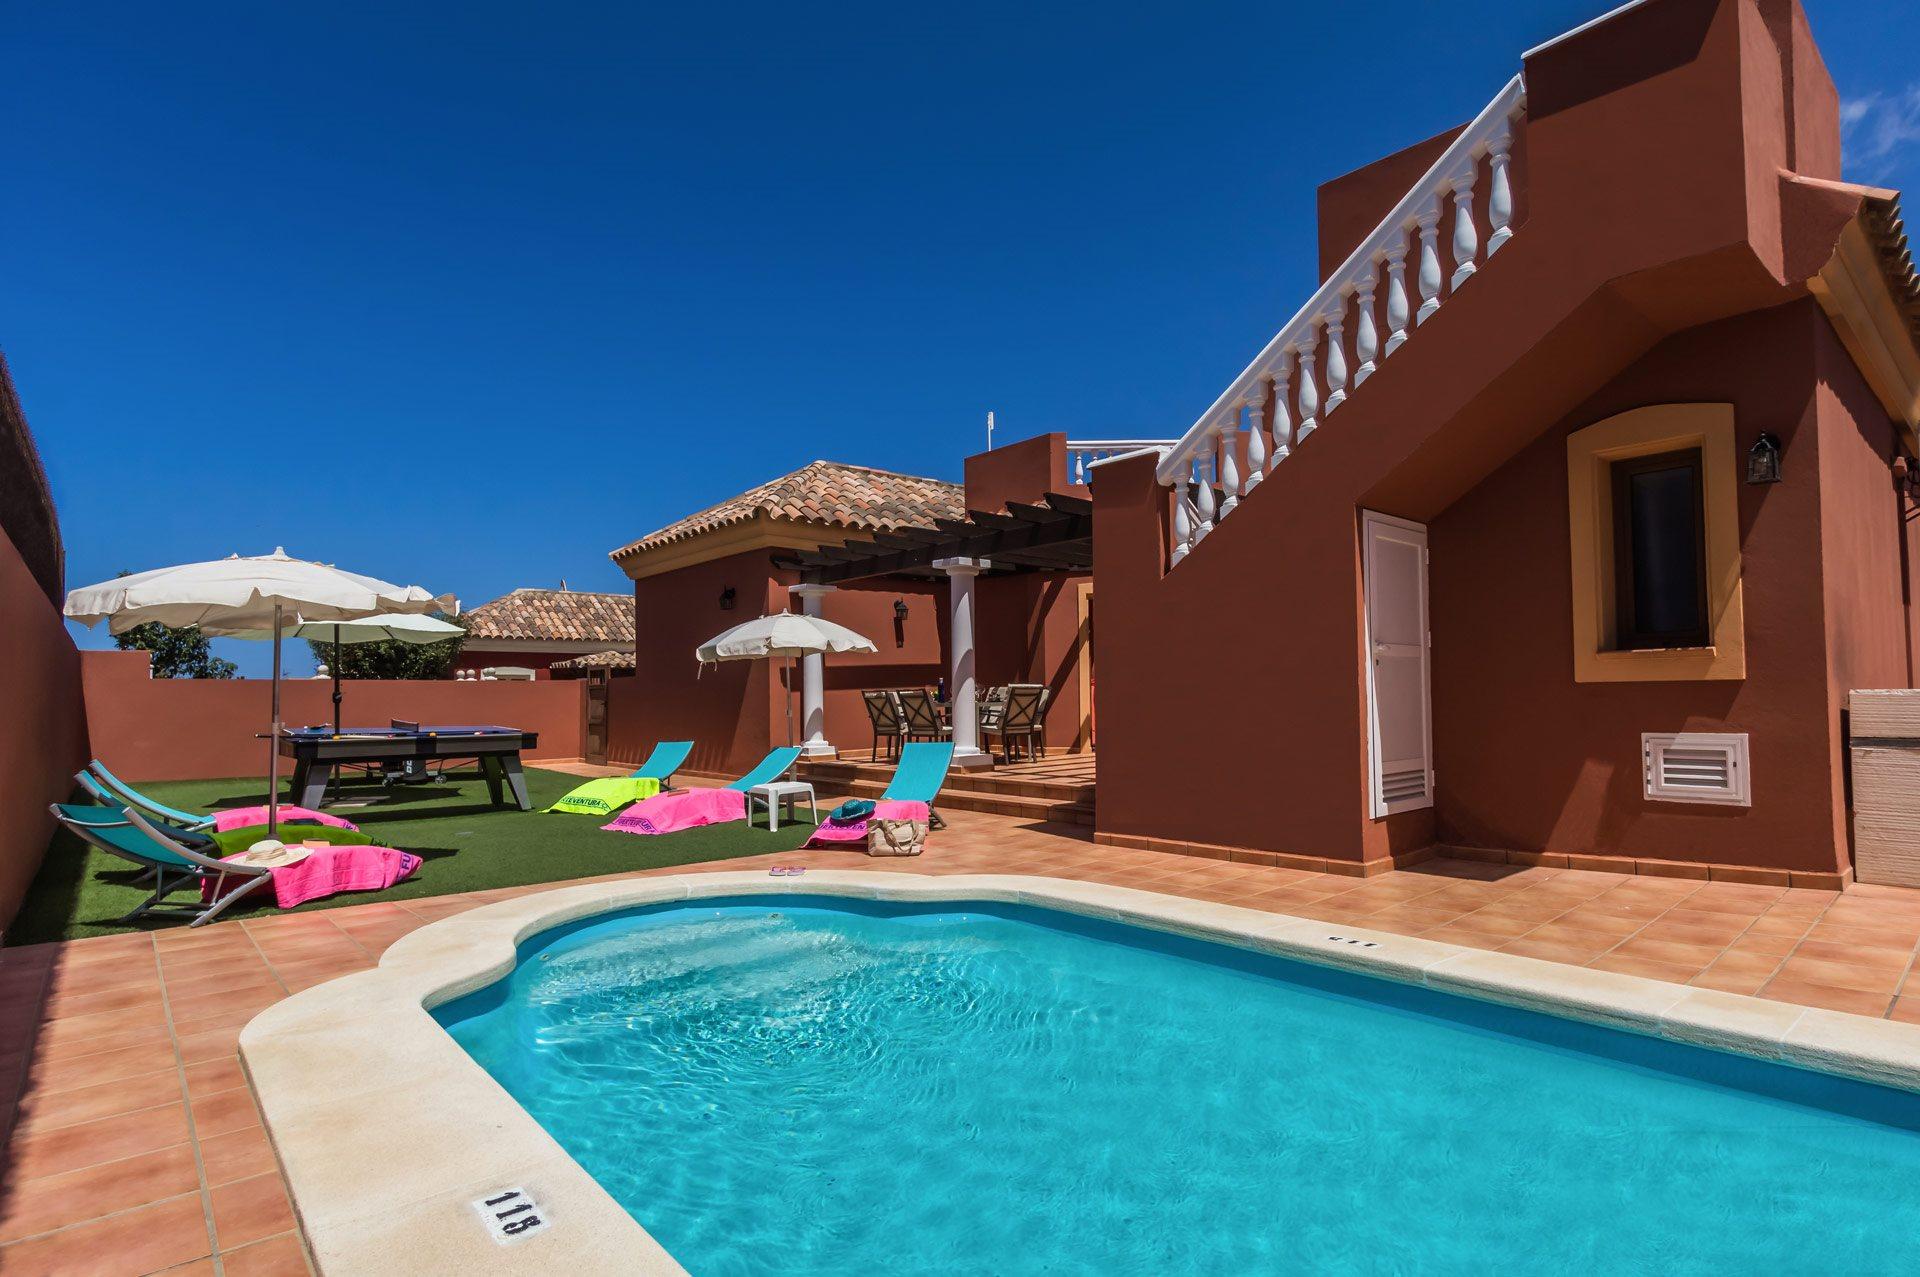 Villa Mar Corralejo, Corralejo, Fuerteventura